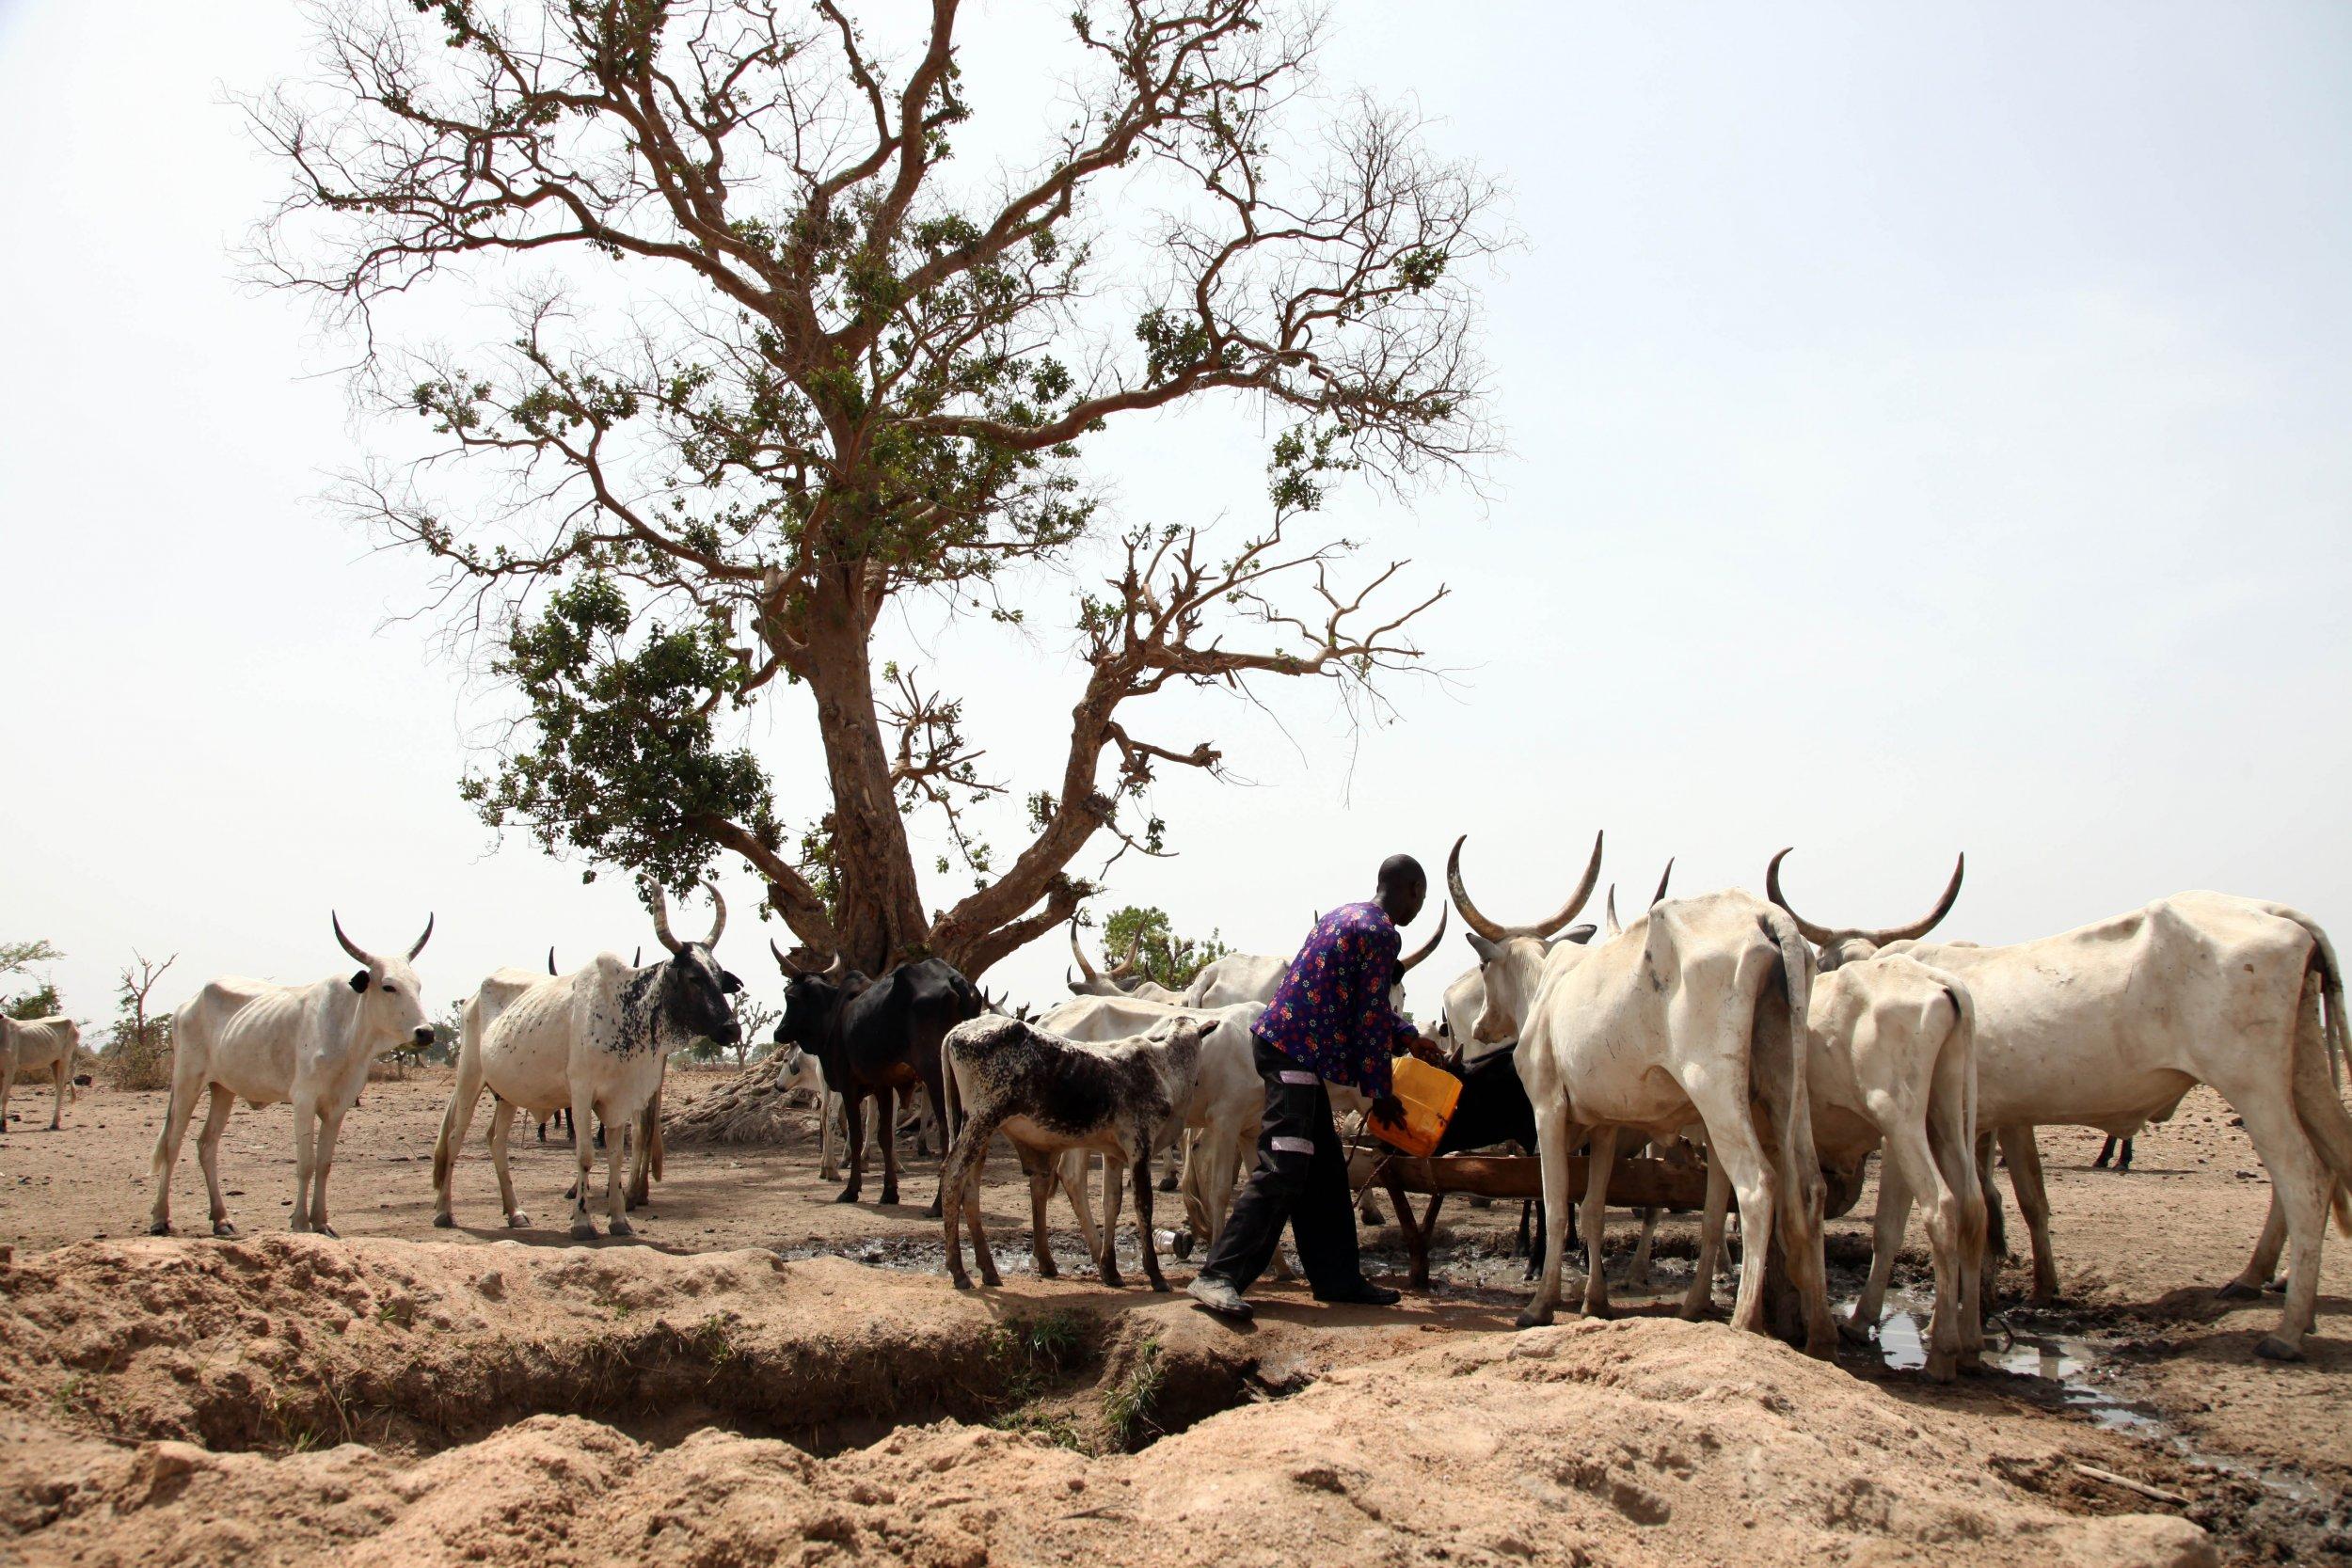 Fulani herdsmen waters cattle in Nigeria.